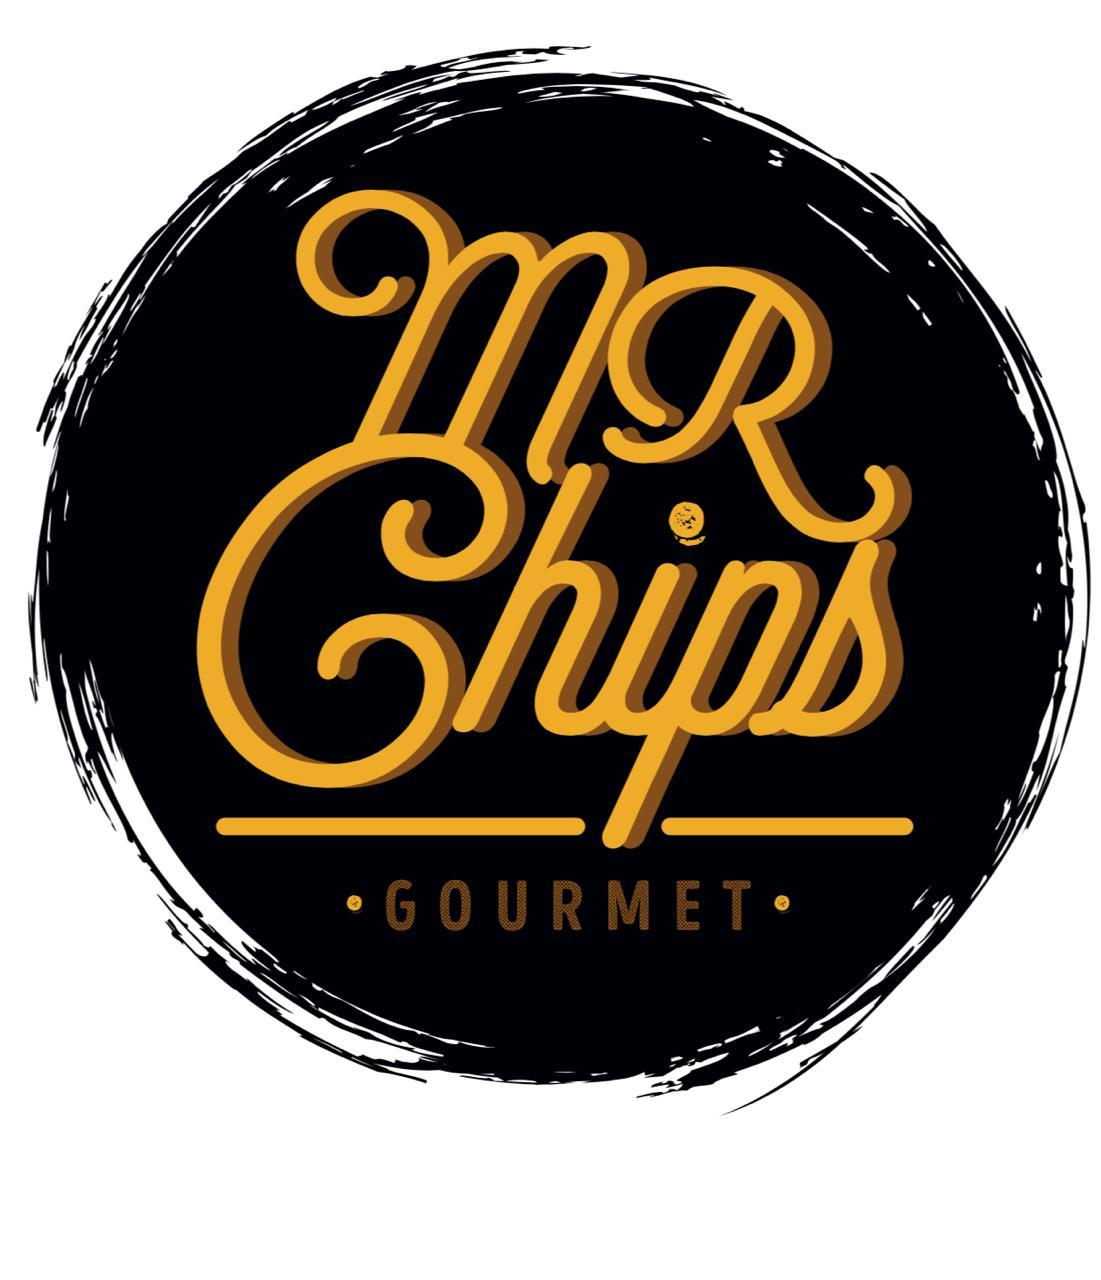 Mr Chips Gourmet